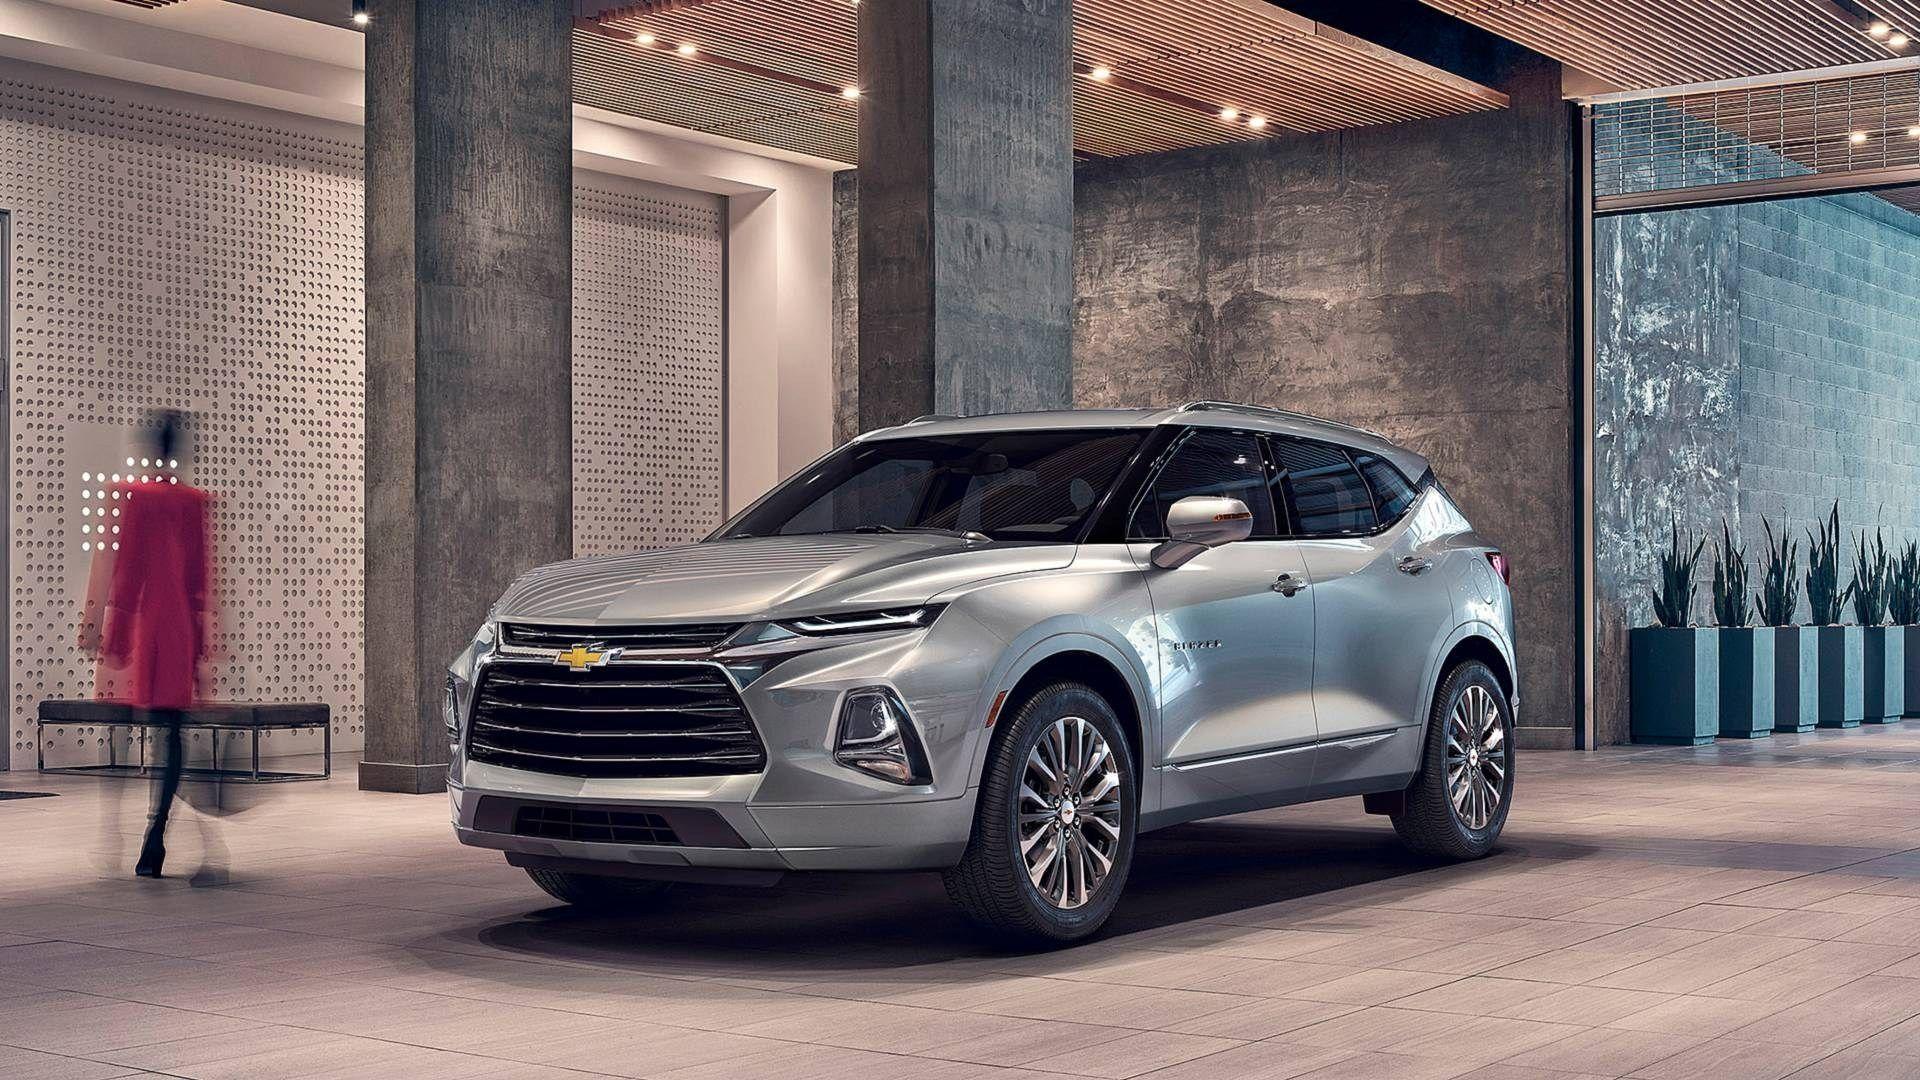 Chevrolet K5 Blazer 2020 Price New chevy, Hot rods cars